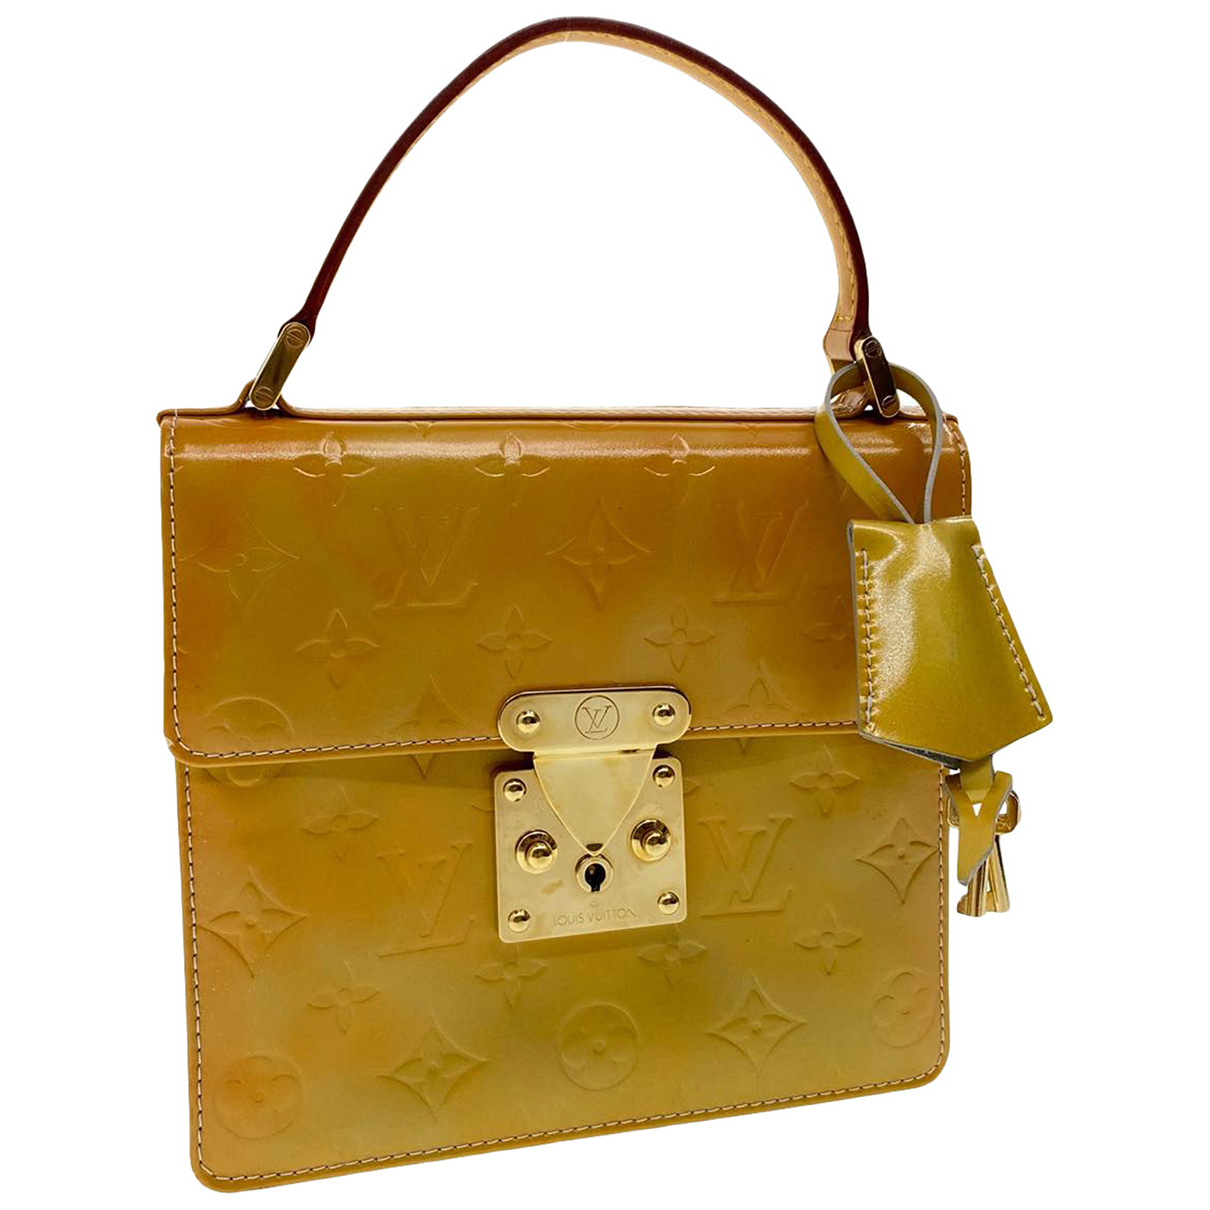 Louis Vuitton Spring street Khaki Patent leather handbag for Women \N